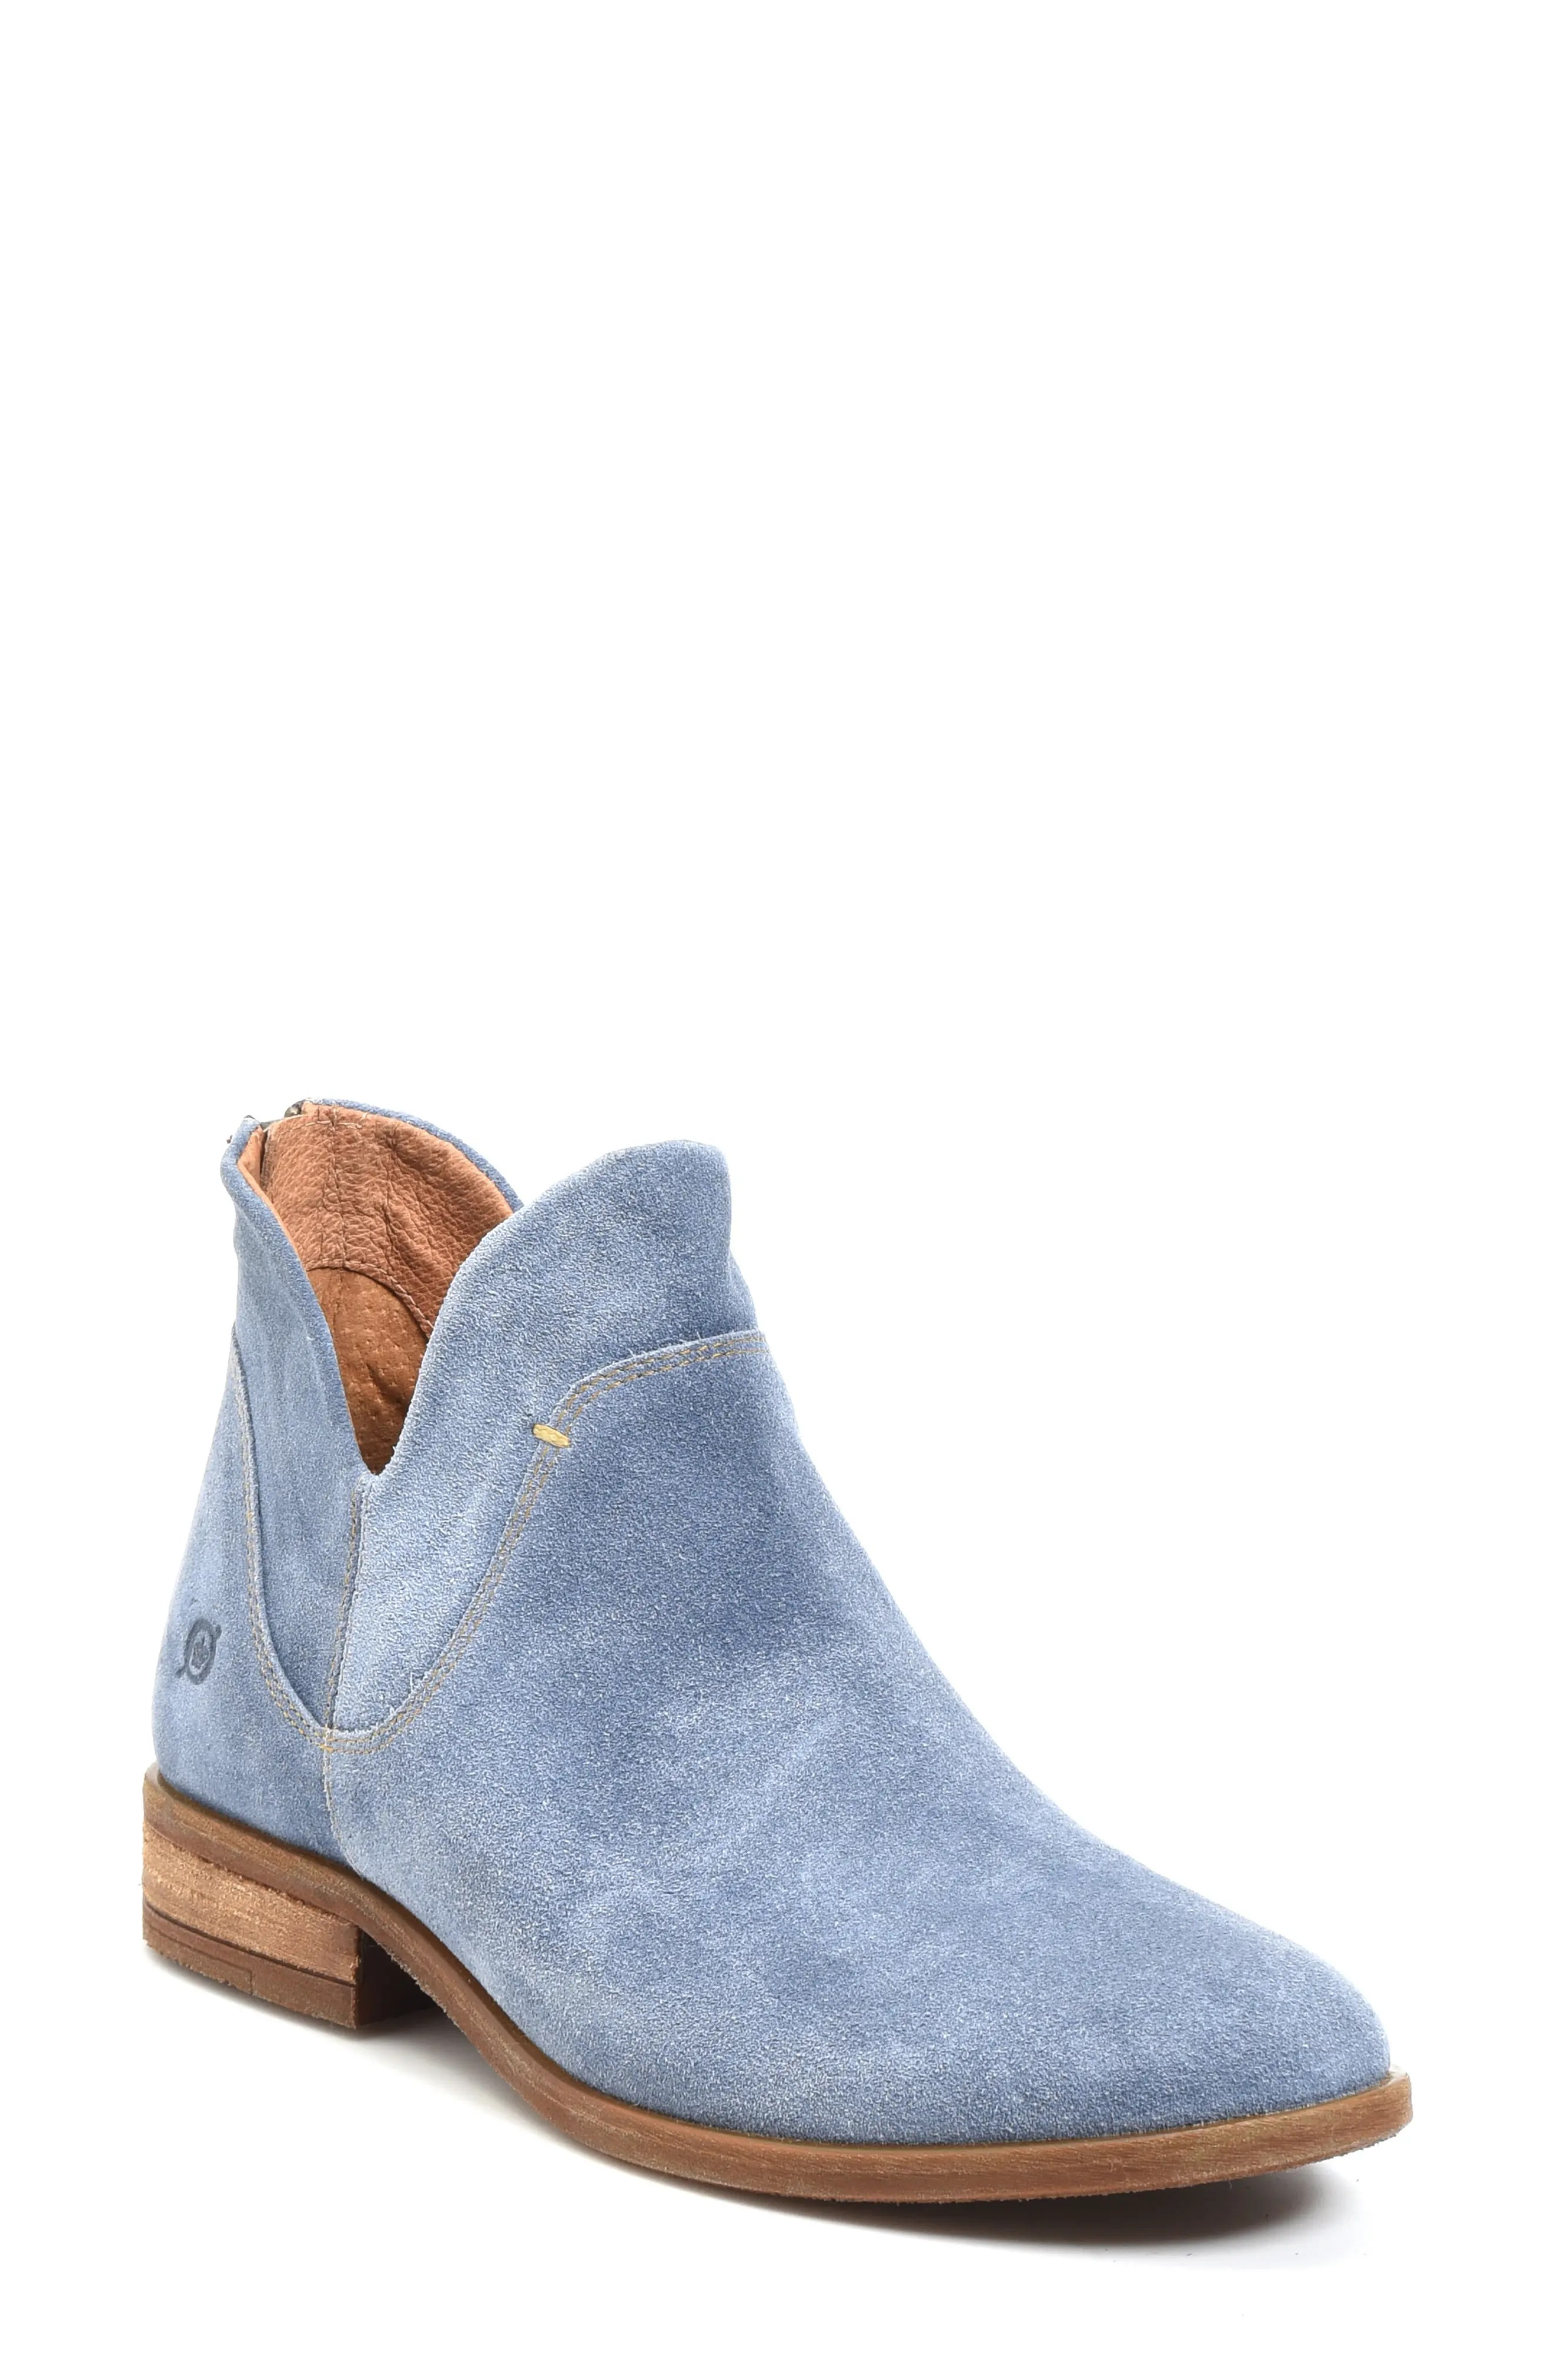 nordstrom rack born womens shoes online